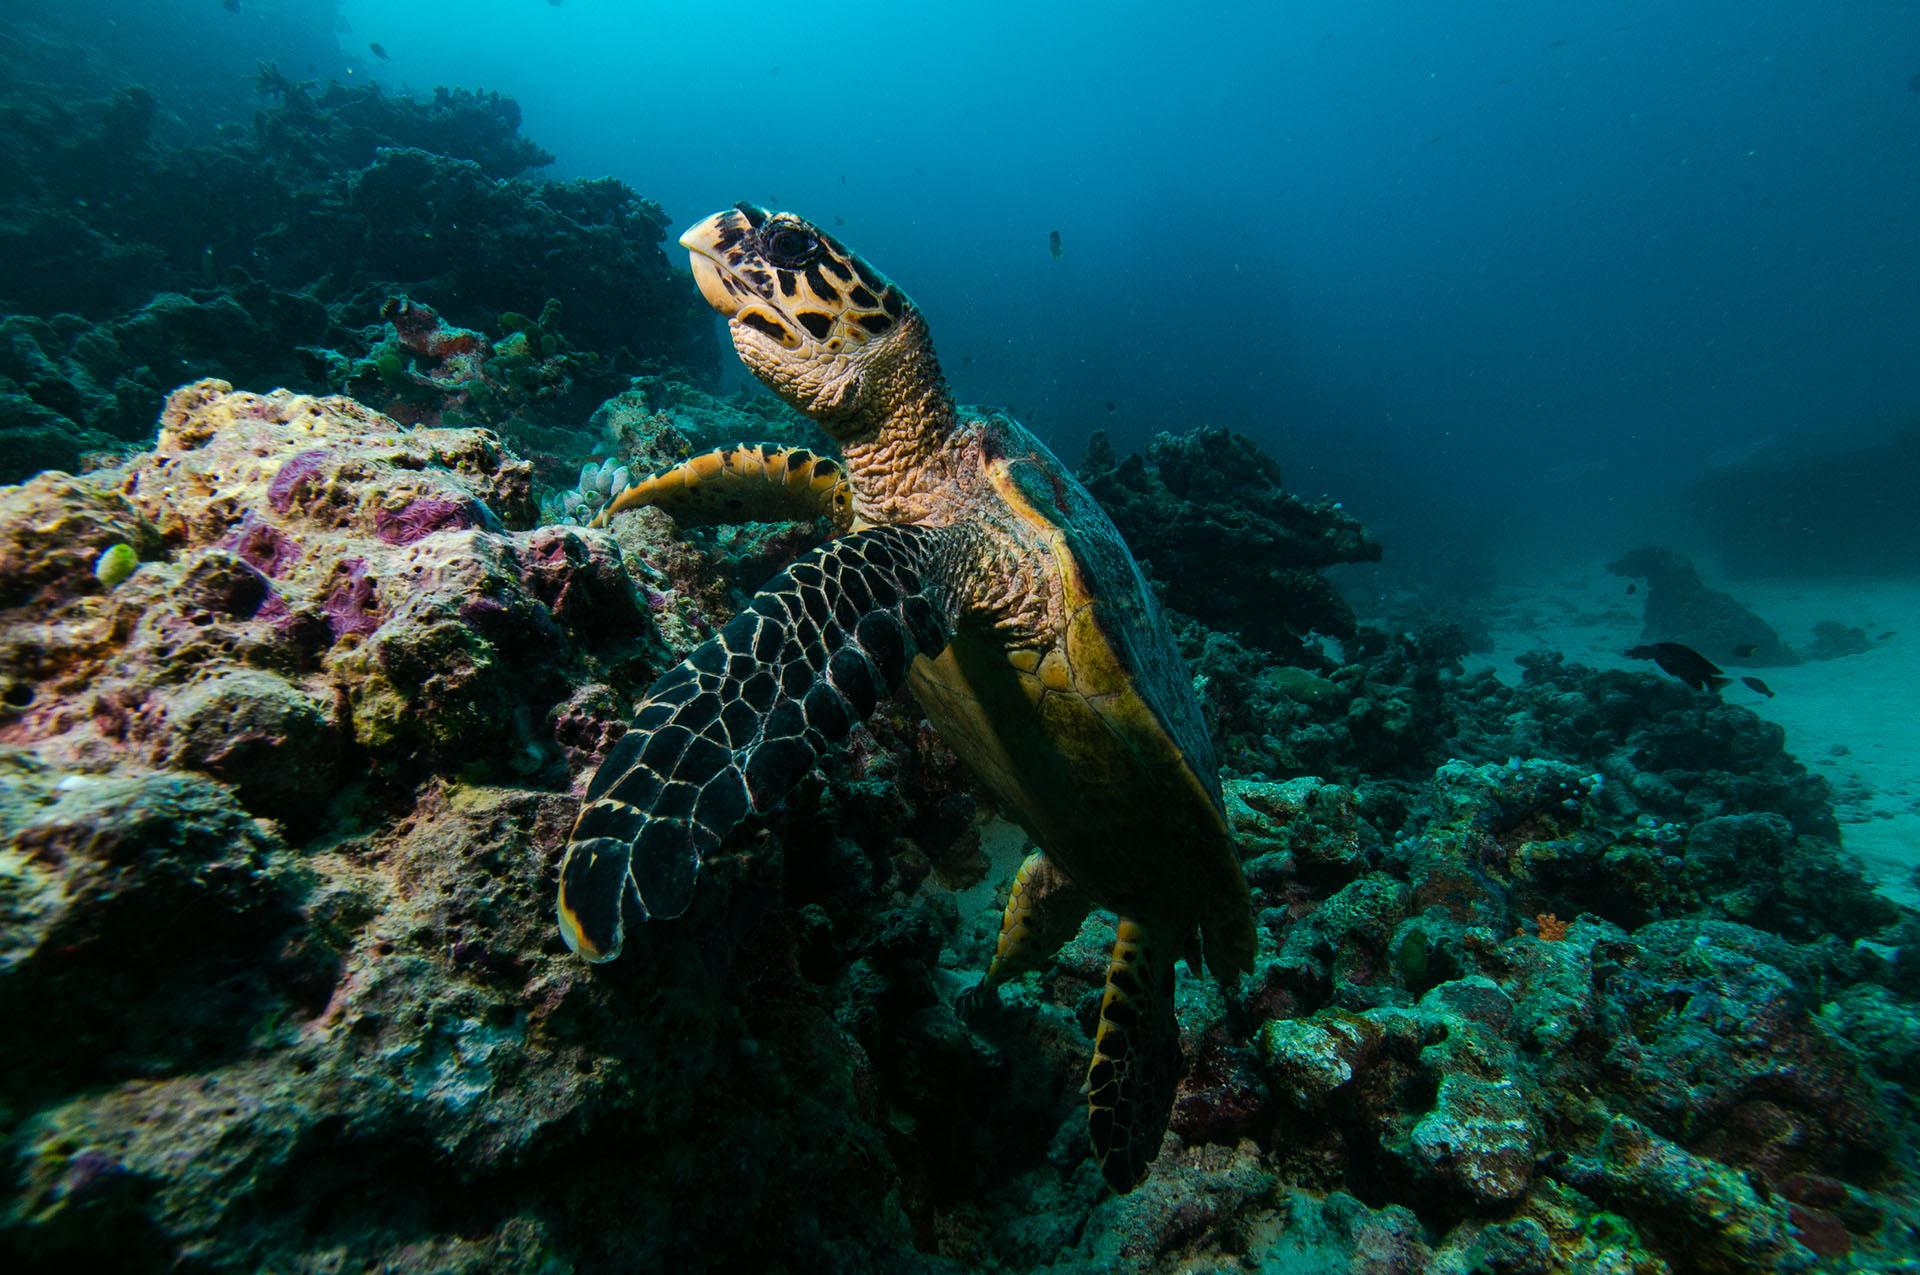 Embudu-Village-Diving-Hawkbills-Sea-Turtle